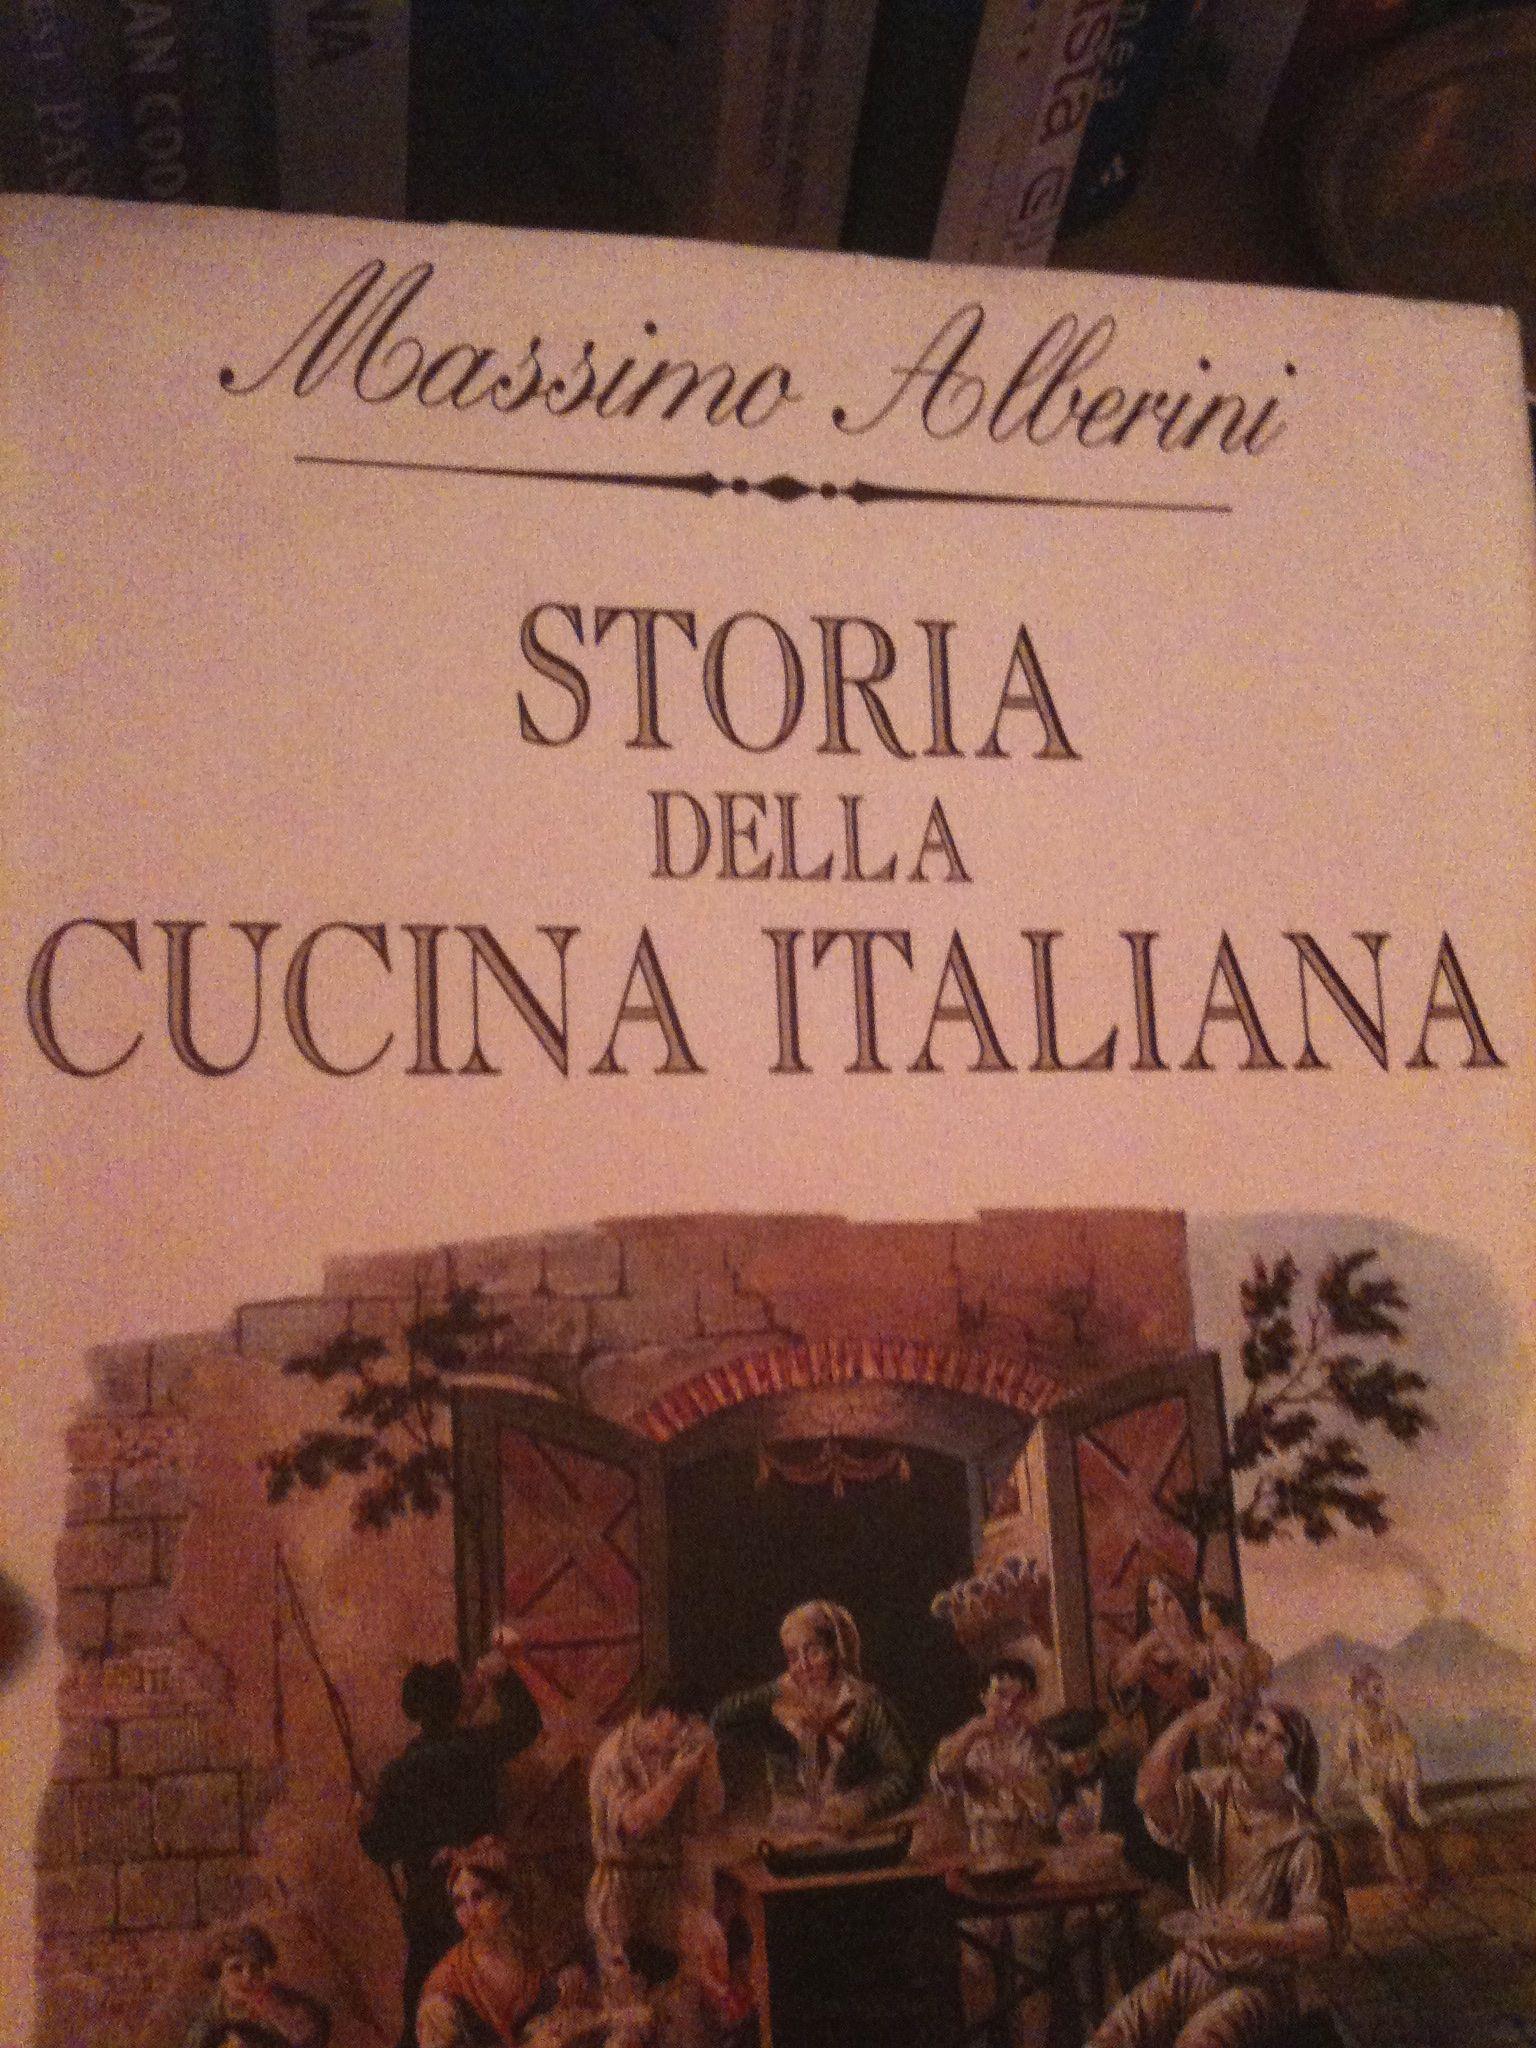 La Storia Della Cucina storia della cucina italiana. lo storico massimo montanari